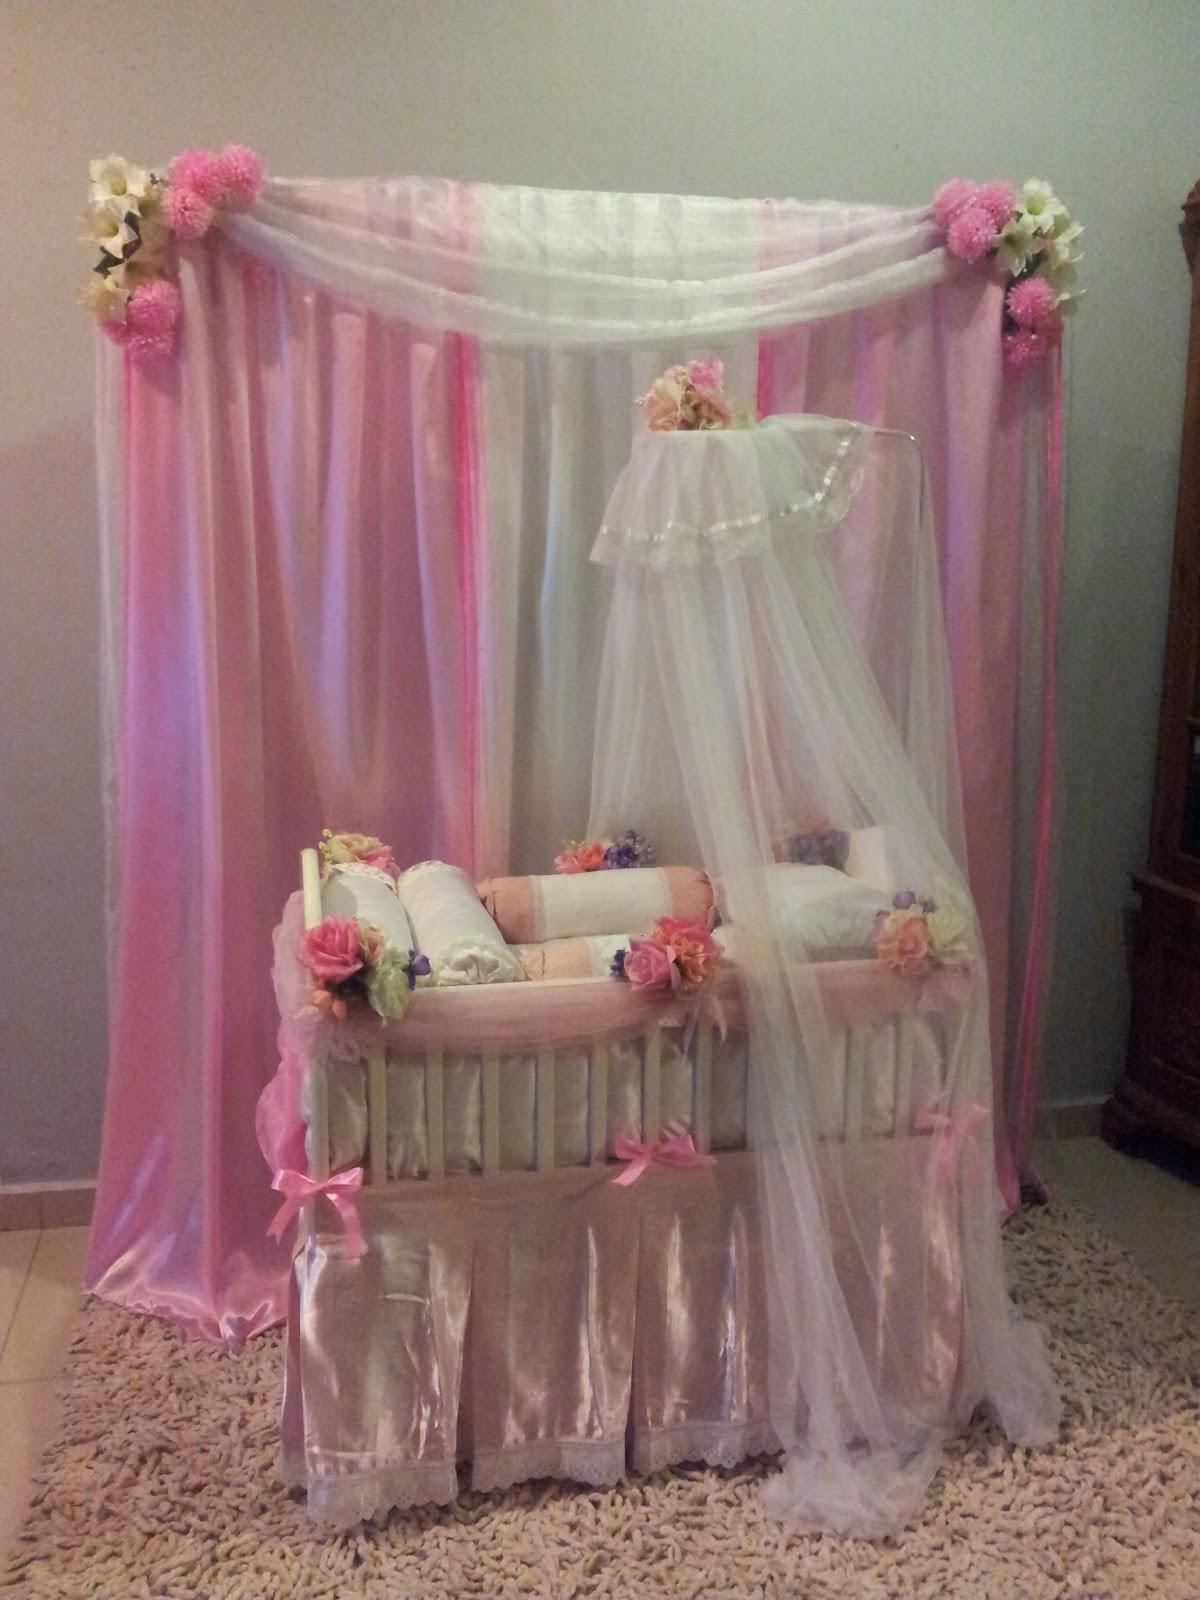 Online gift shop by sweet 39 n 39 rosy innovatif kraf aqiqah for Idea doorgift untuk aqiqah